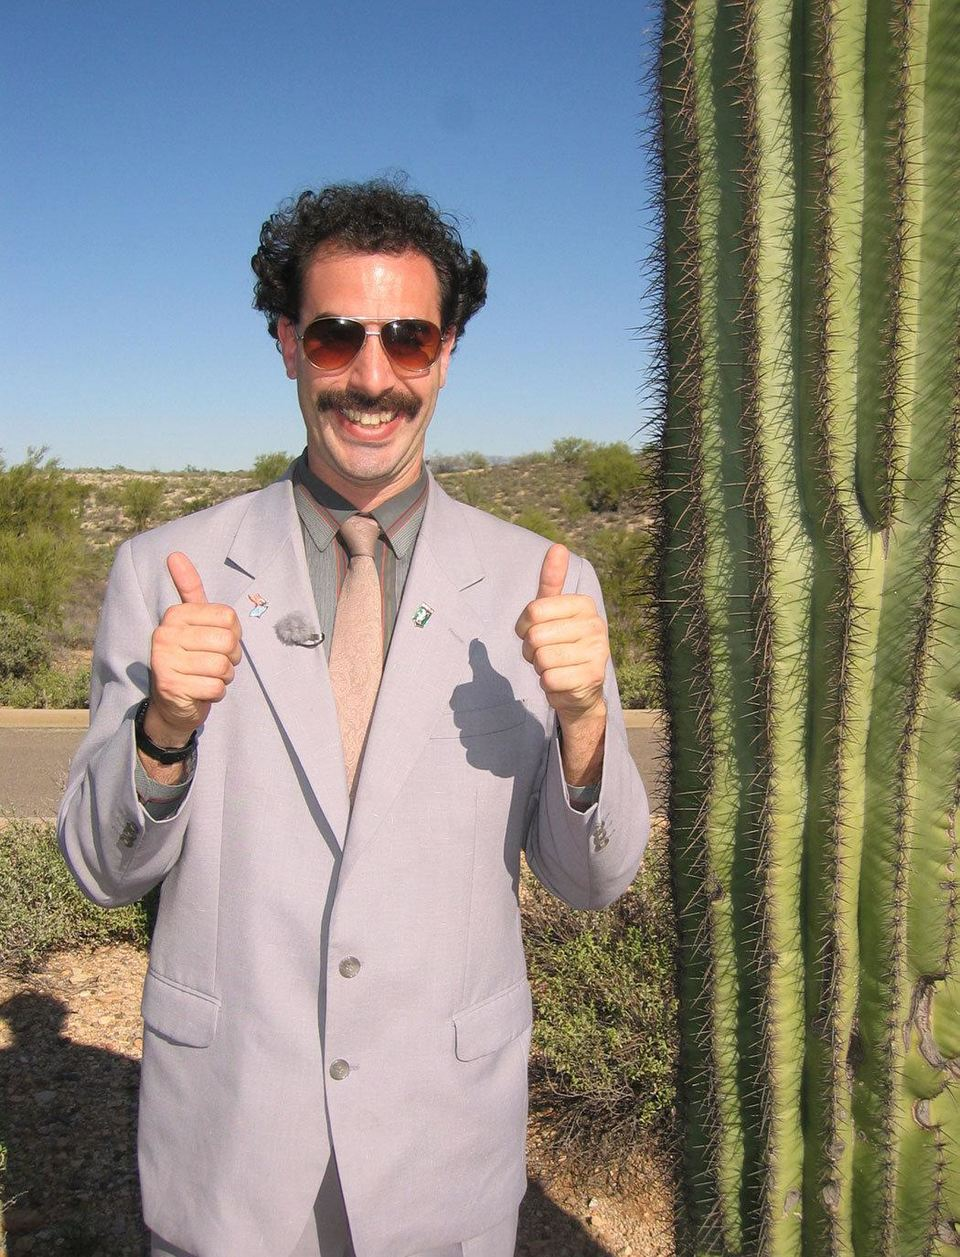 Film Borat: Nakoukání do amerycké kultůry na obědnávku slavnoj kazašskoj národu